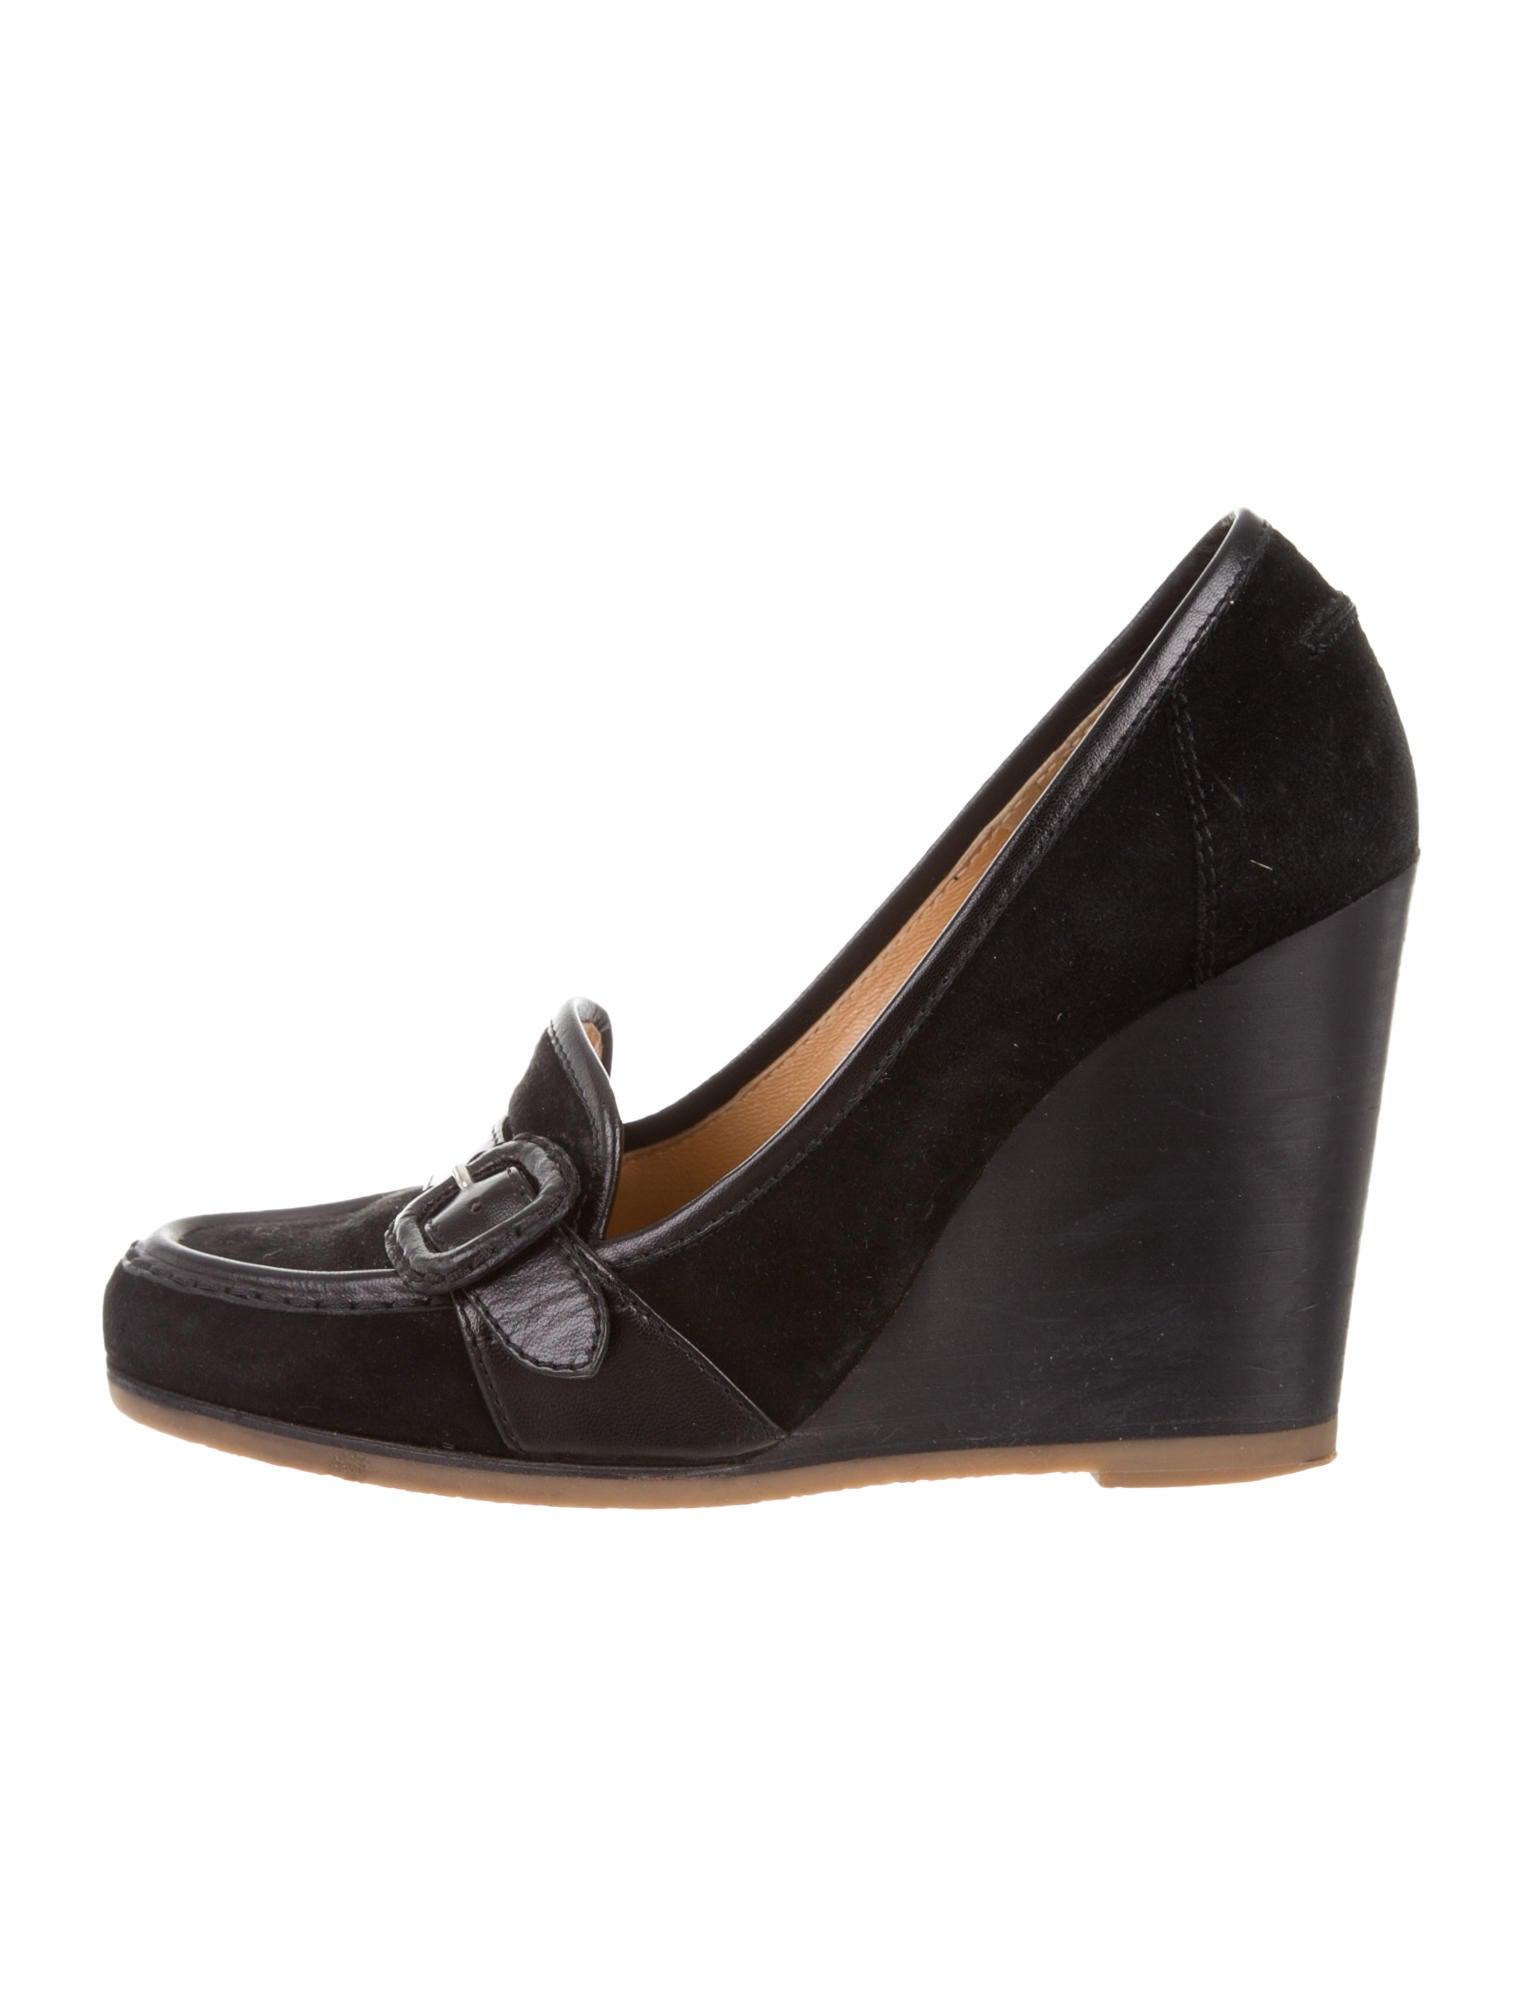 hermes women shoes - photo #28